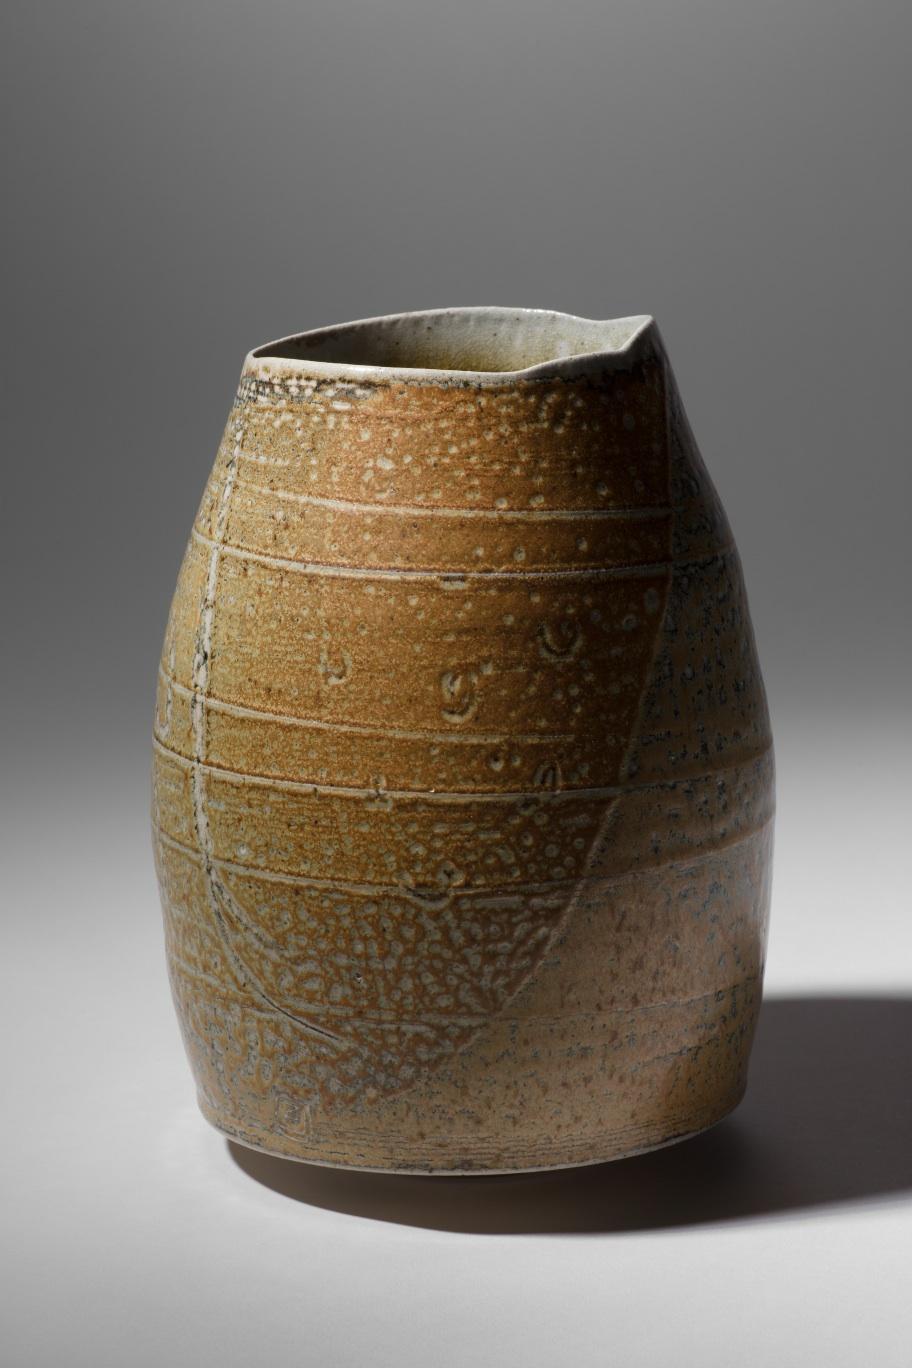 Mandy Parslow, MP09 Barrel Vessel, wood fired salt glazed stoneware, 20 x 14cm, EUR 280